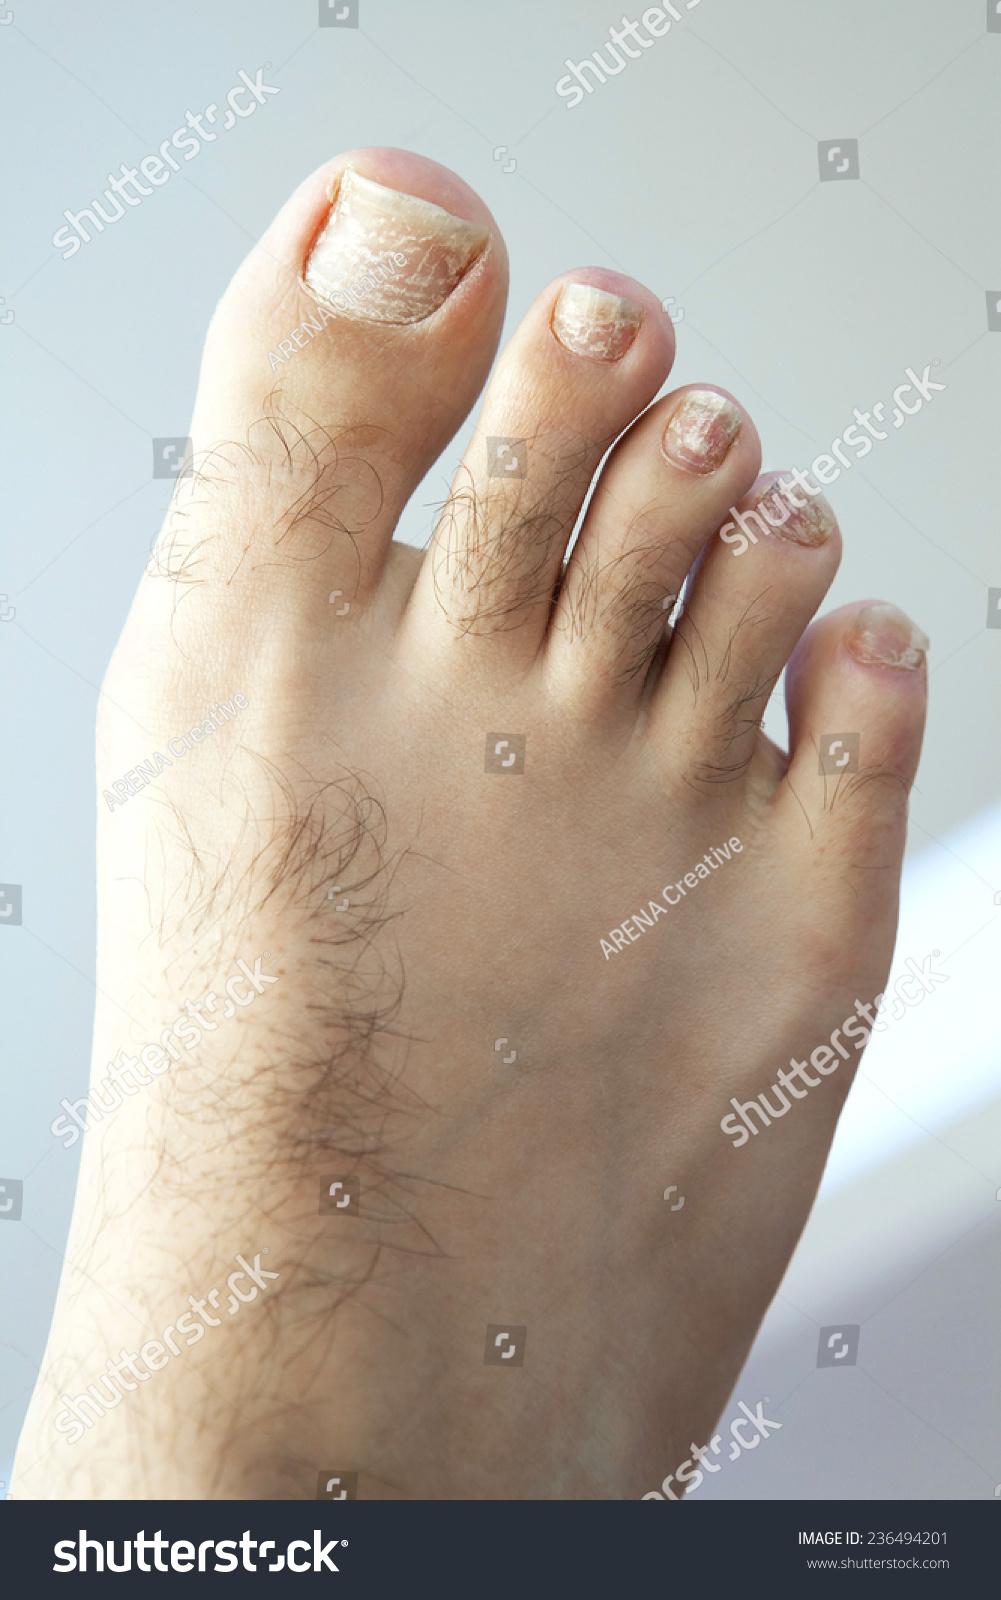 Closeup Human Foot Toes Cracked Peeling Stock Photo (Royalty Free ...